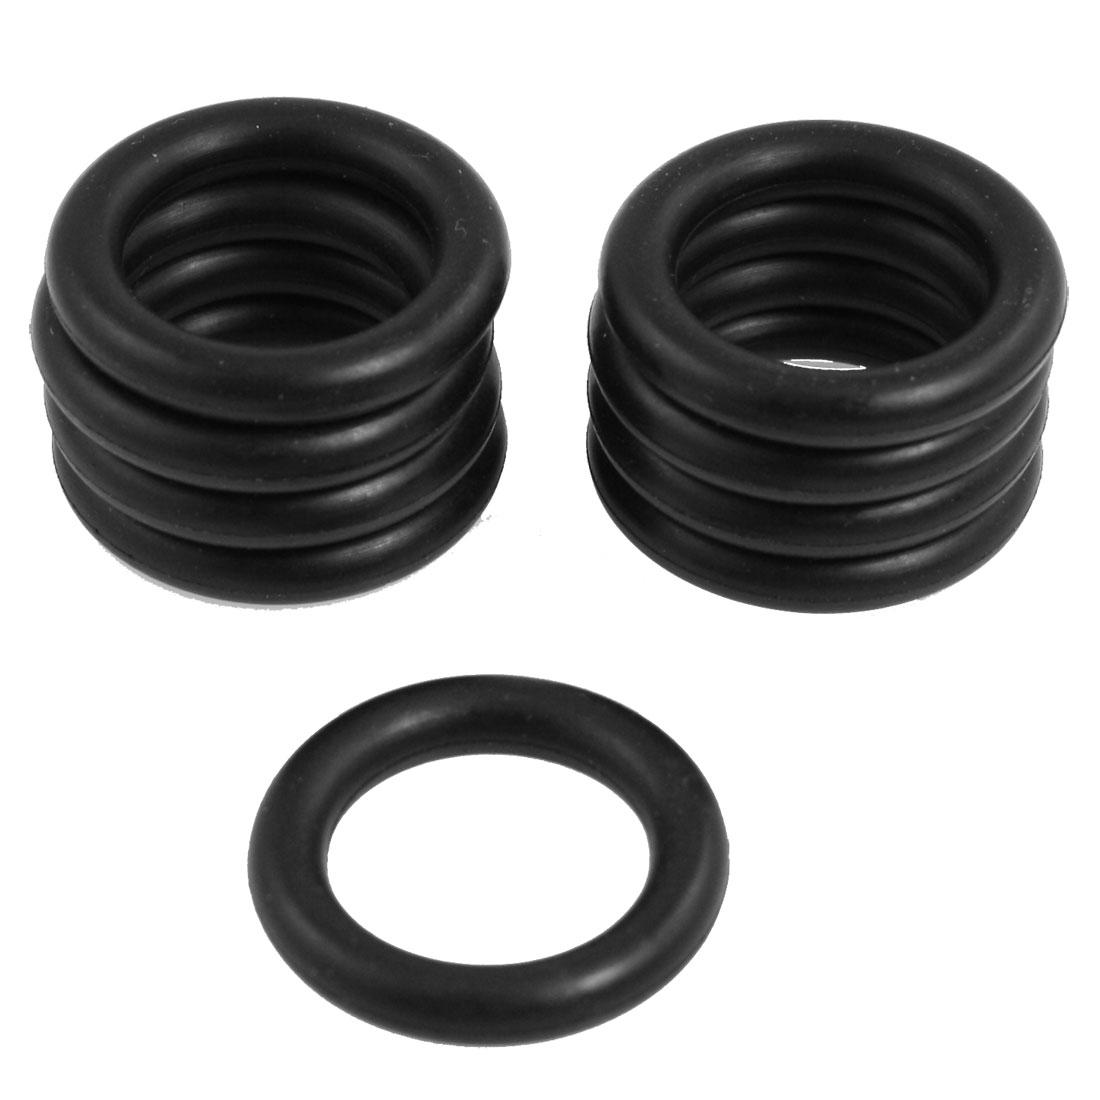 10 Pcs Black Nitrile Rubber O Ring NBR Seal Washer 30mm x 5mm